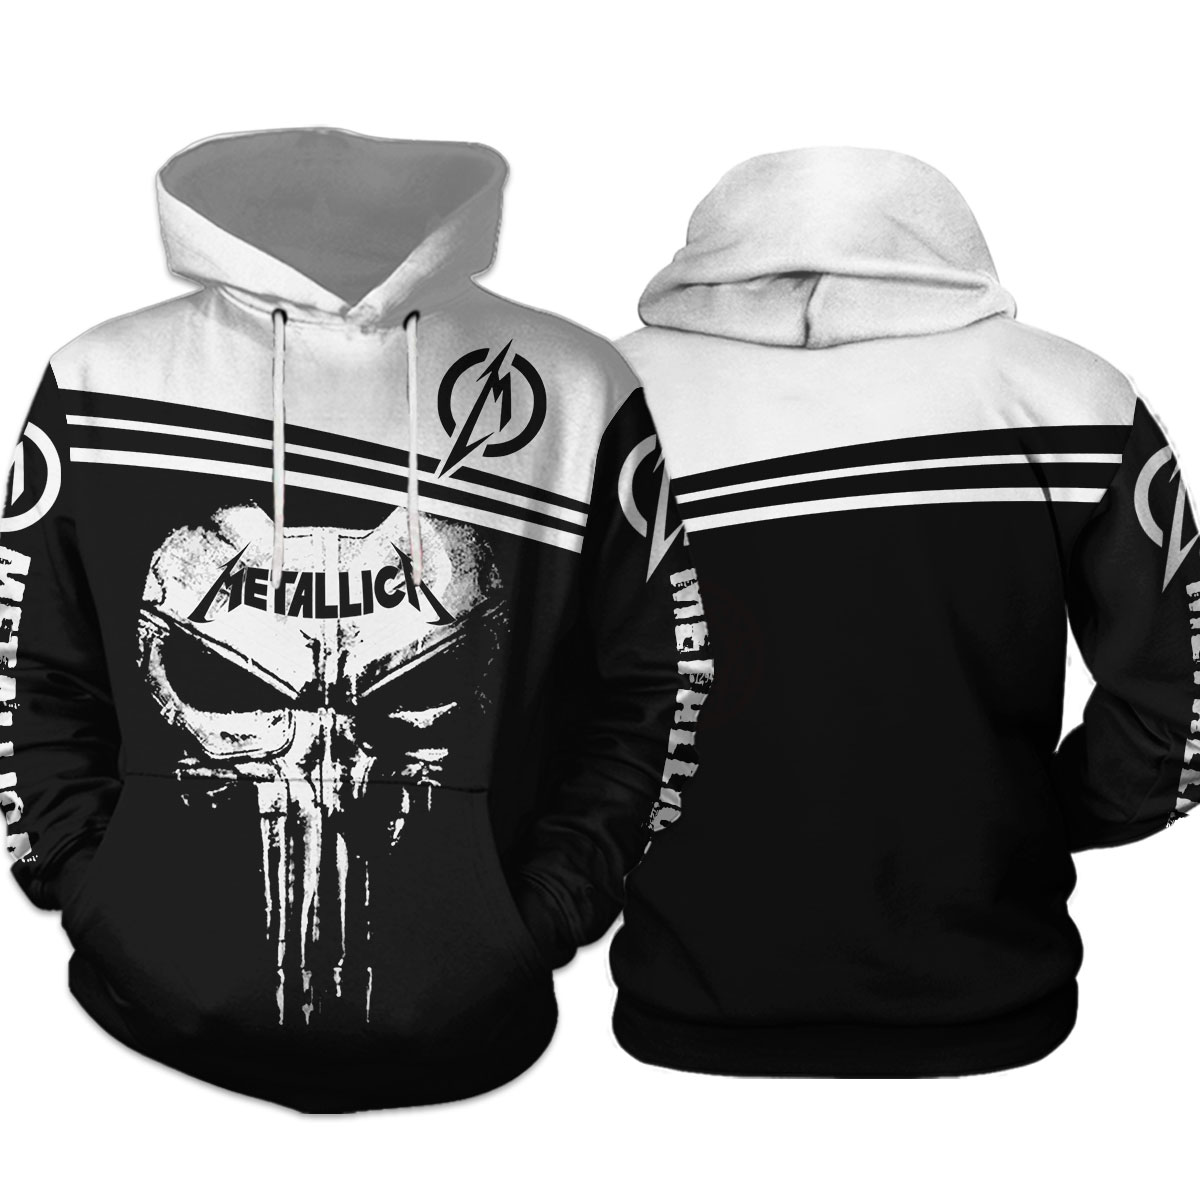 Skull metallica all over print hoodie 1